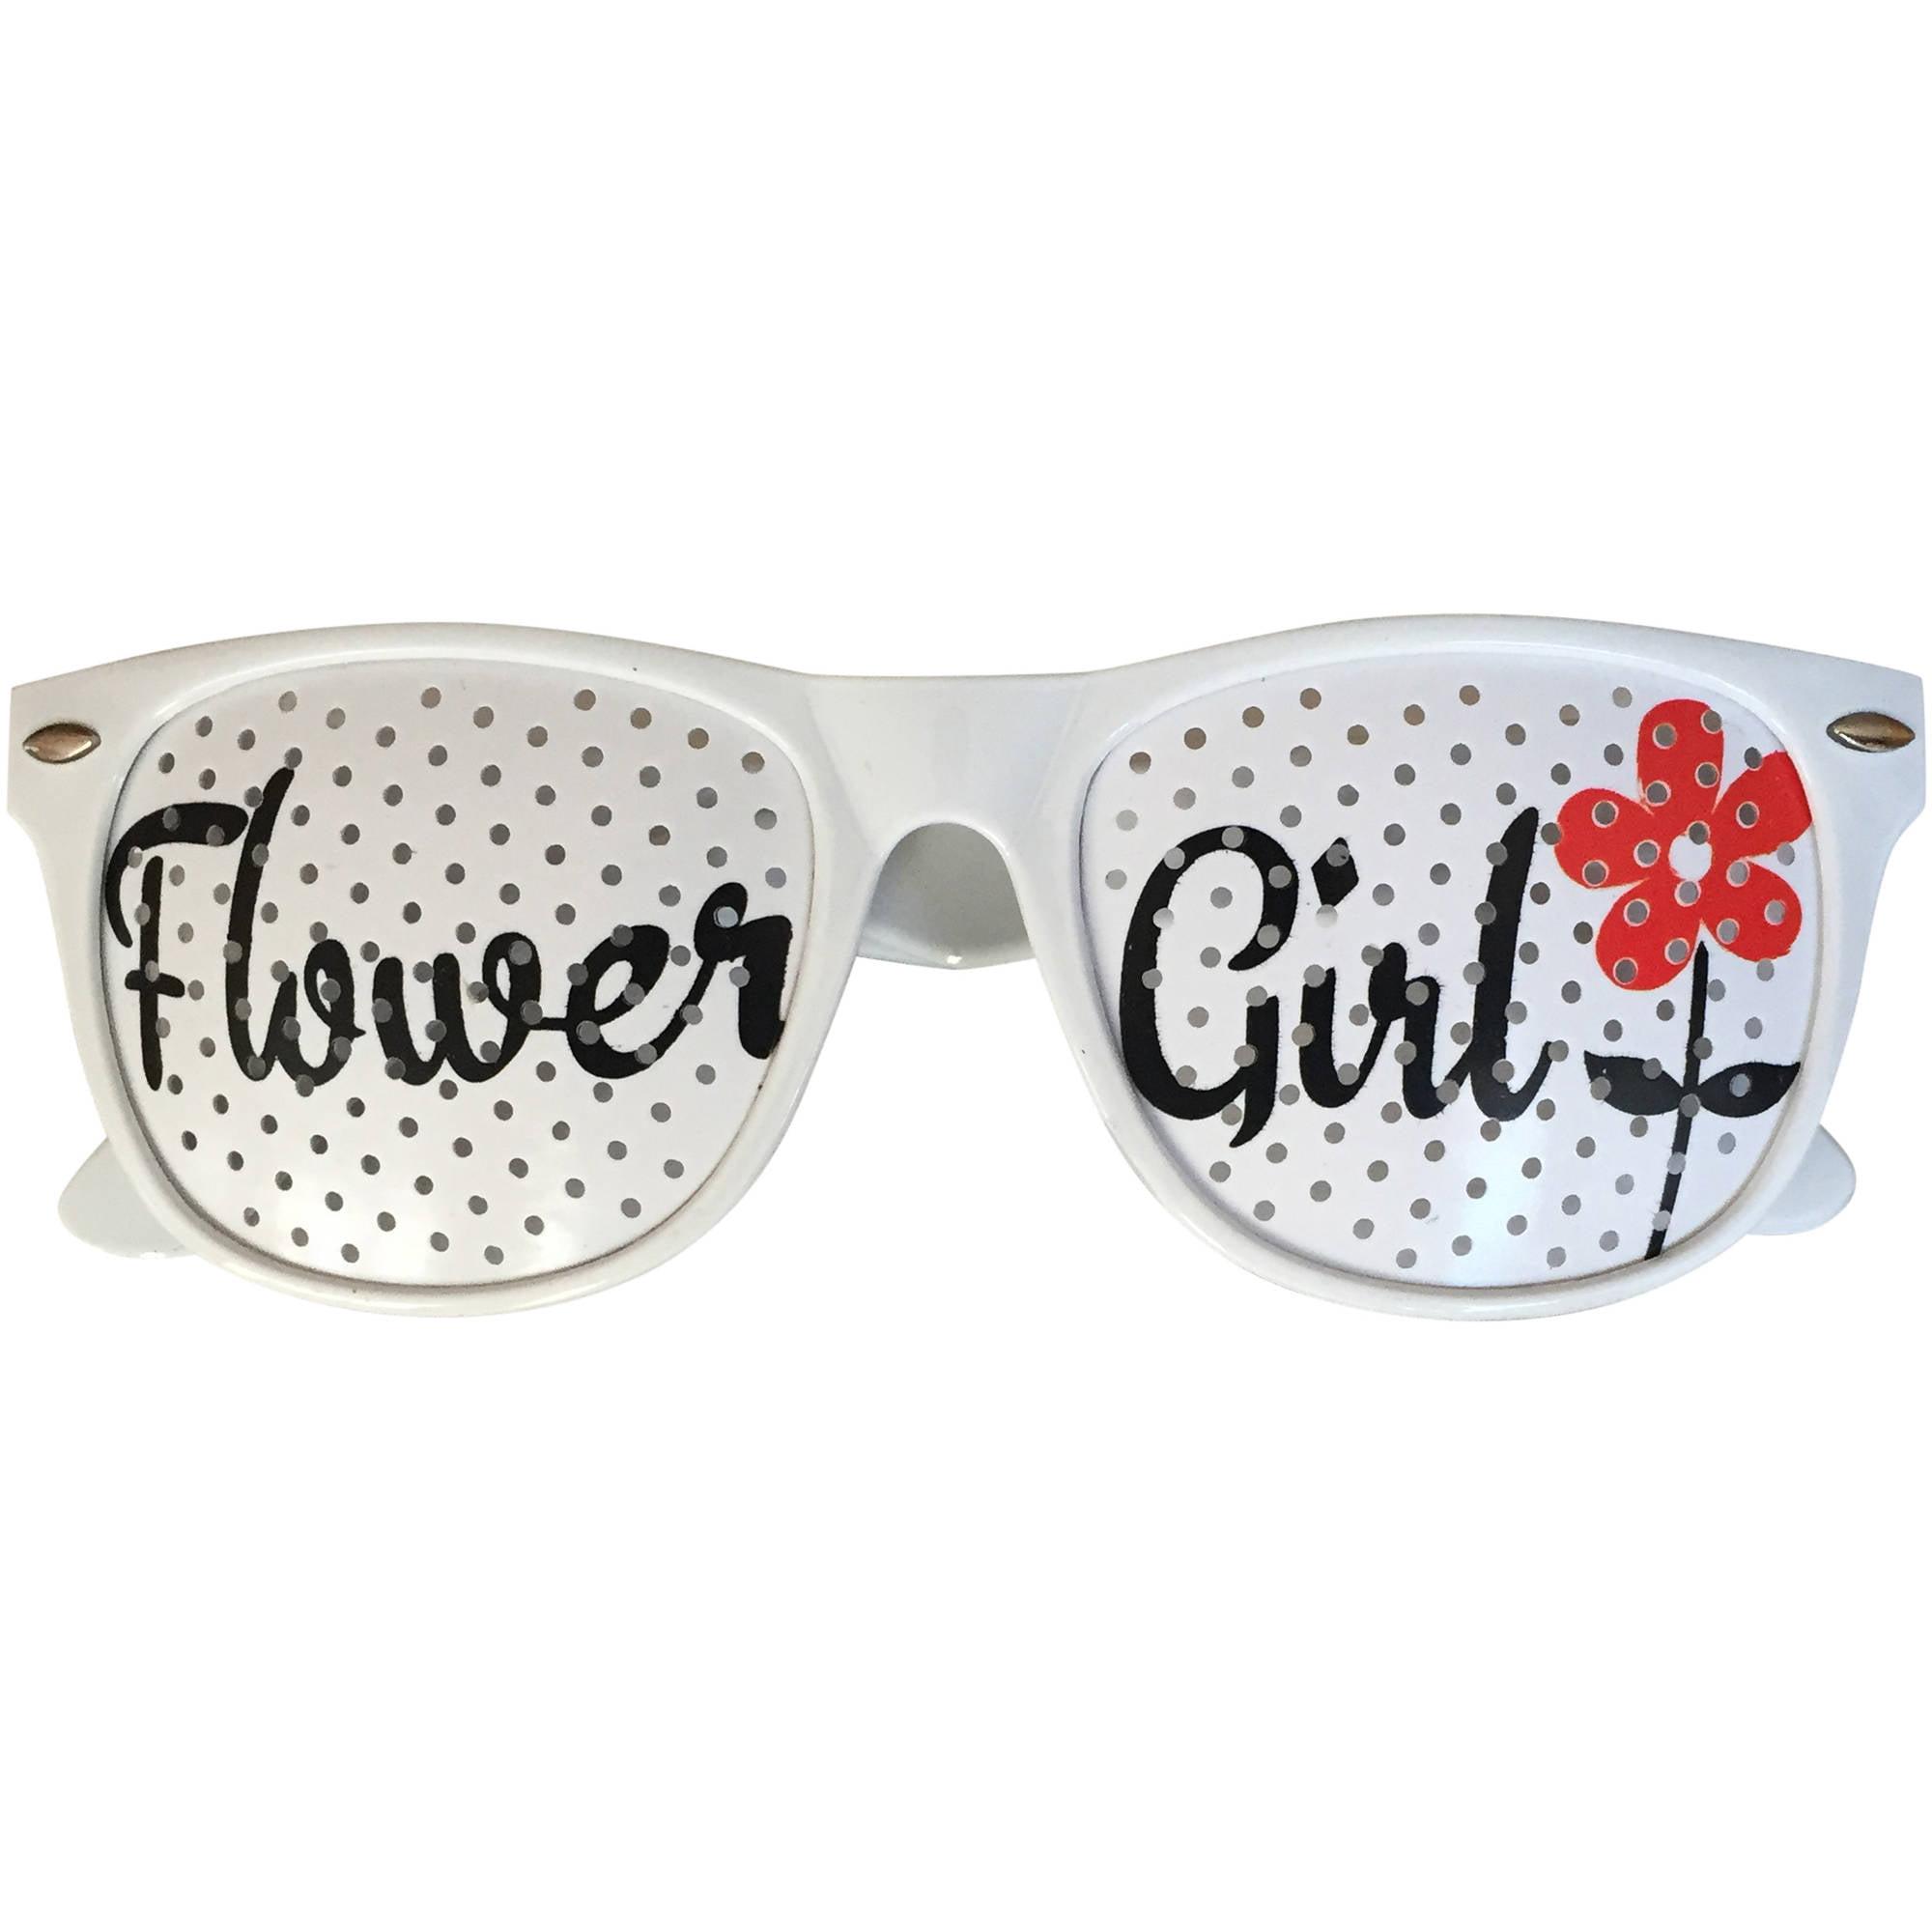 Flower Girl Wedding Party Sunglasses - Walmart.com